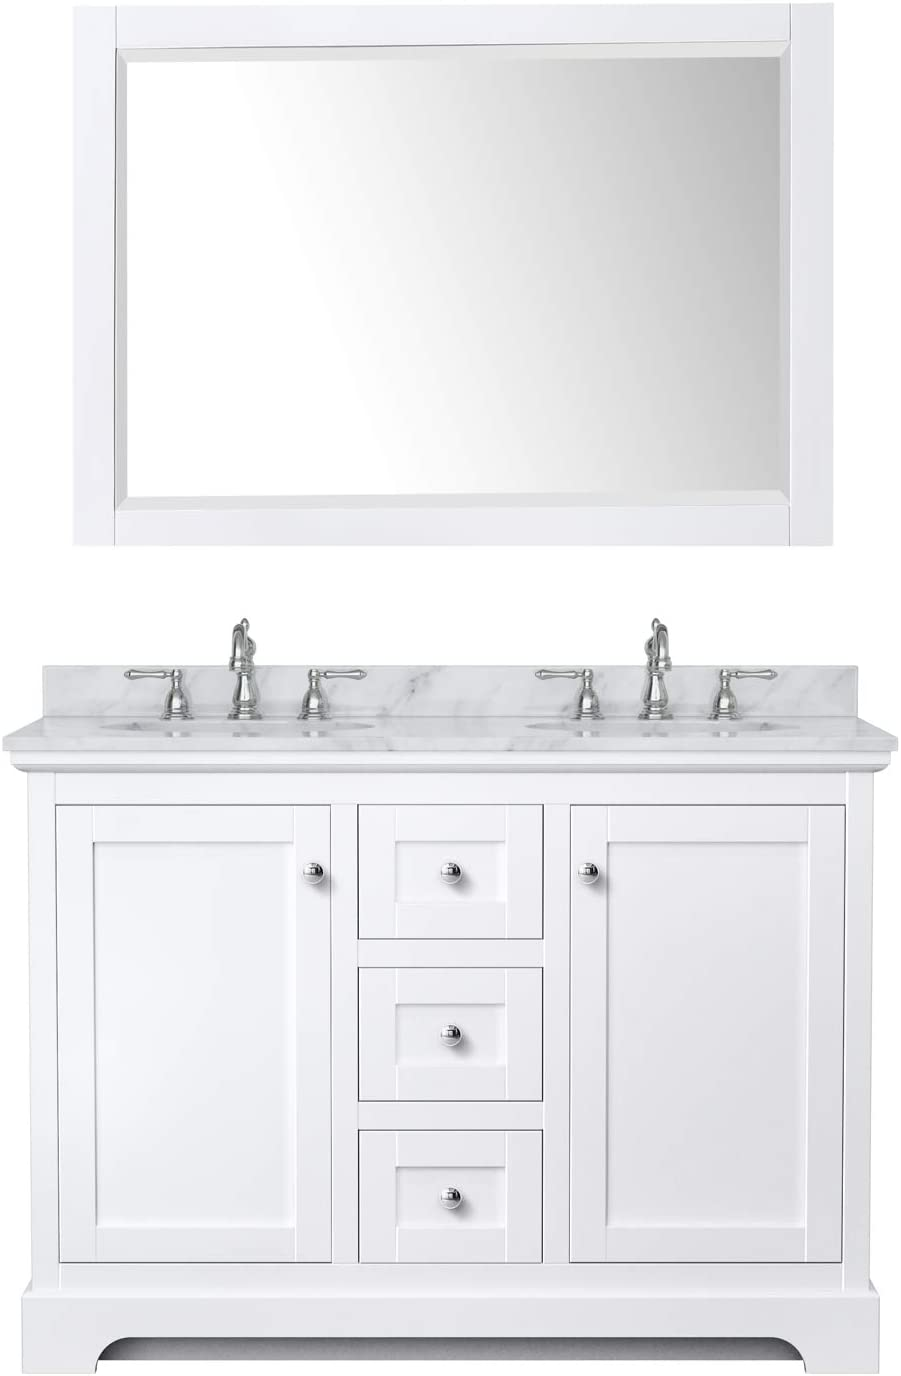 Undermount Oval Sinks Avery 48 Inch Double Bathroom Vanity In White White Carrara Marble Countertop 46 Inch Mirror Bathroom Sink Vanities Accessories Tools Home Improvement Fcteutonia05 De